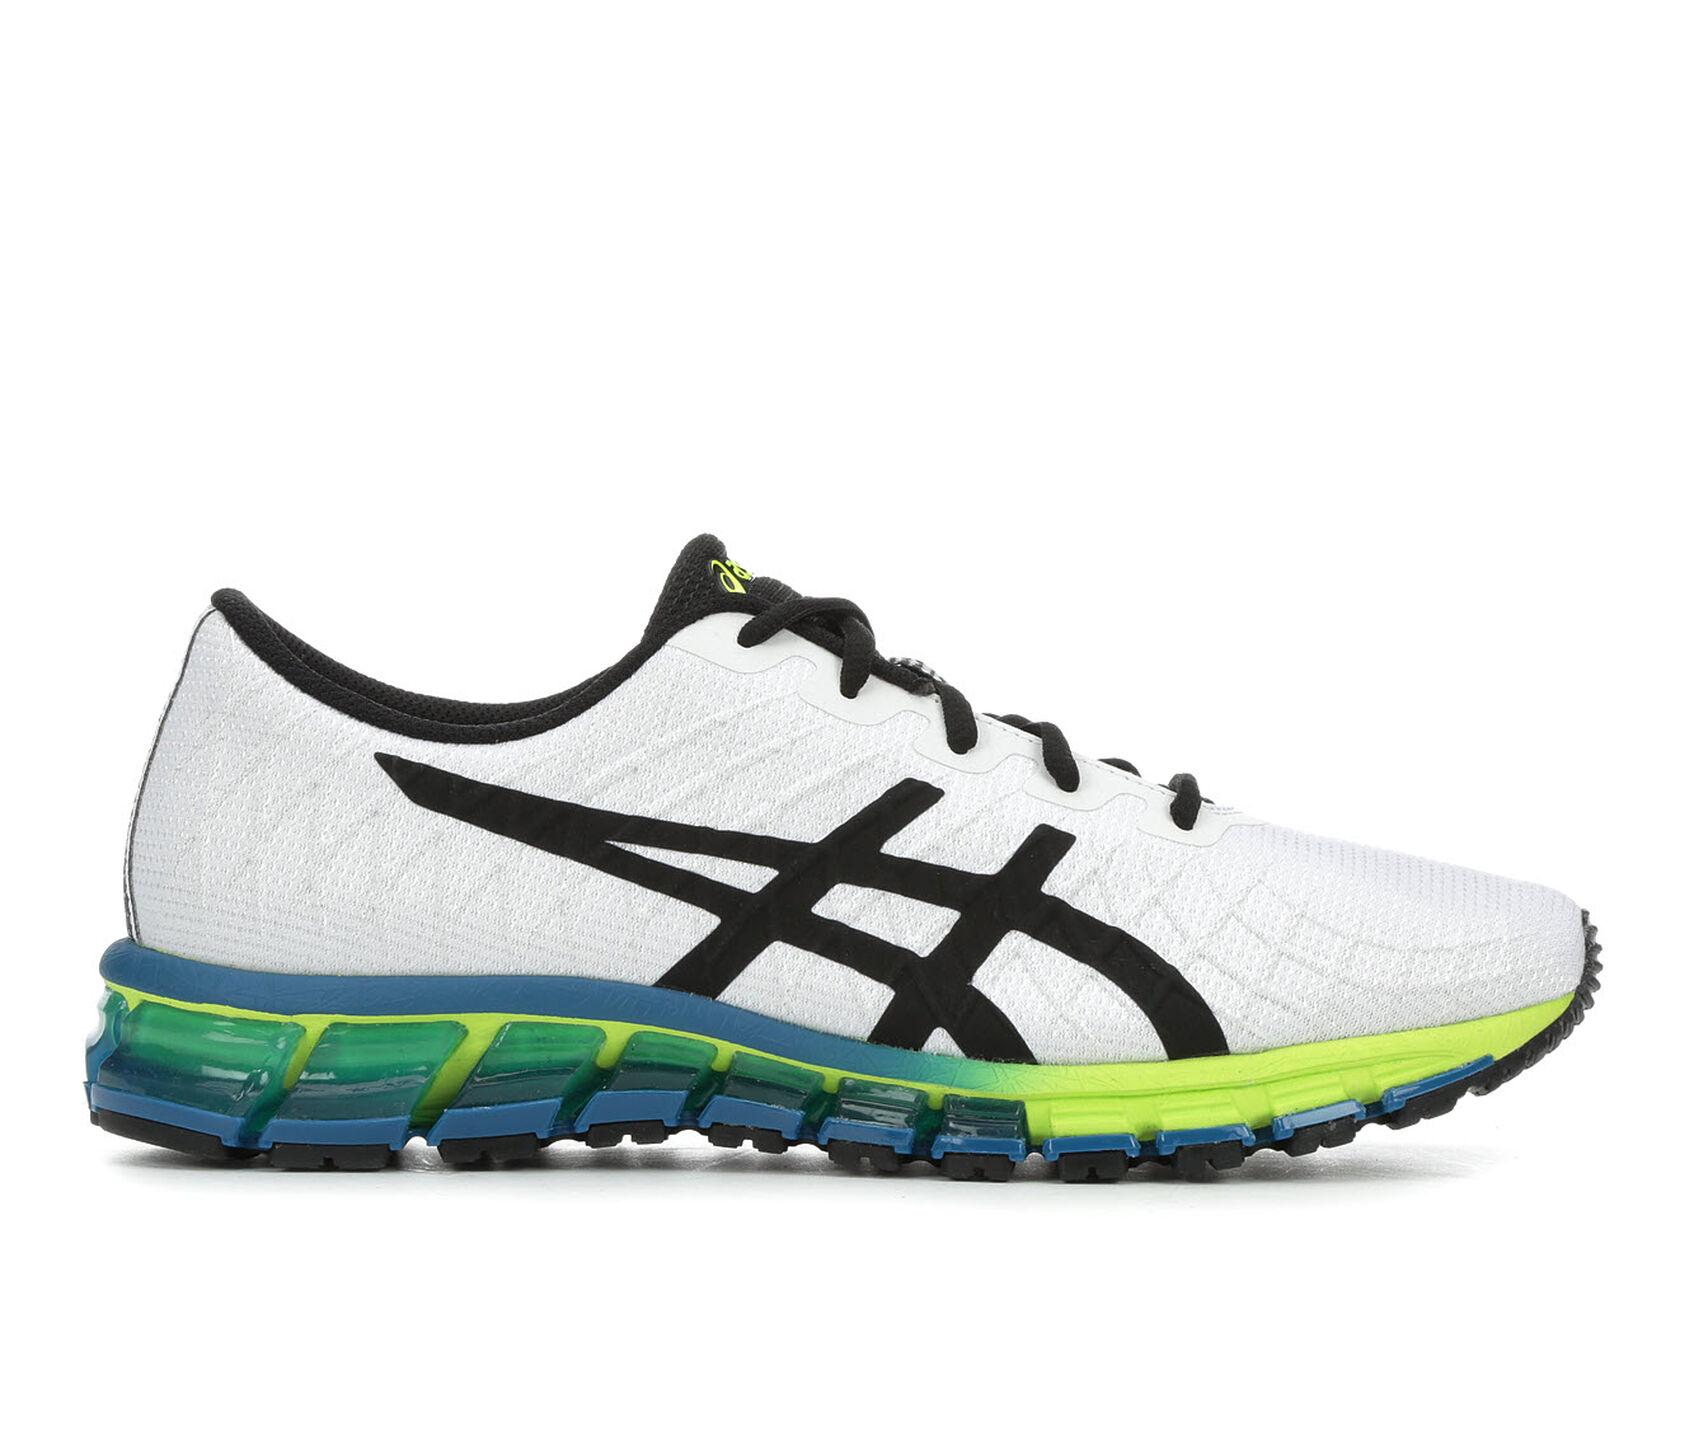 half off 92bd0 a7f21 Men's ASICS Gel Quantum 180 4 - M Running Shoes